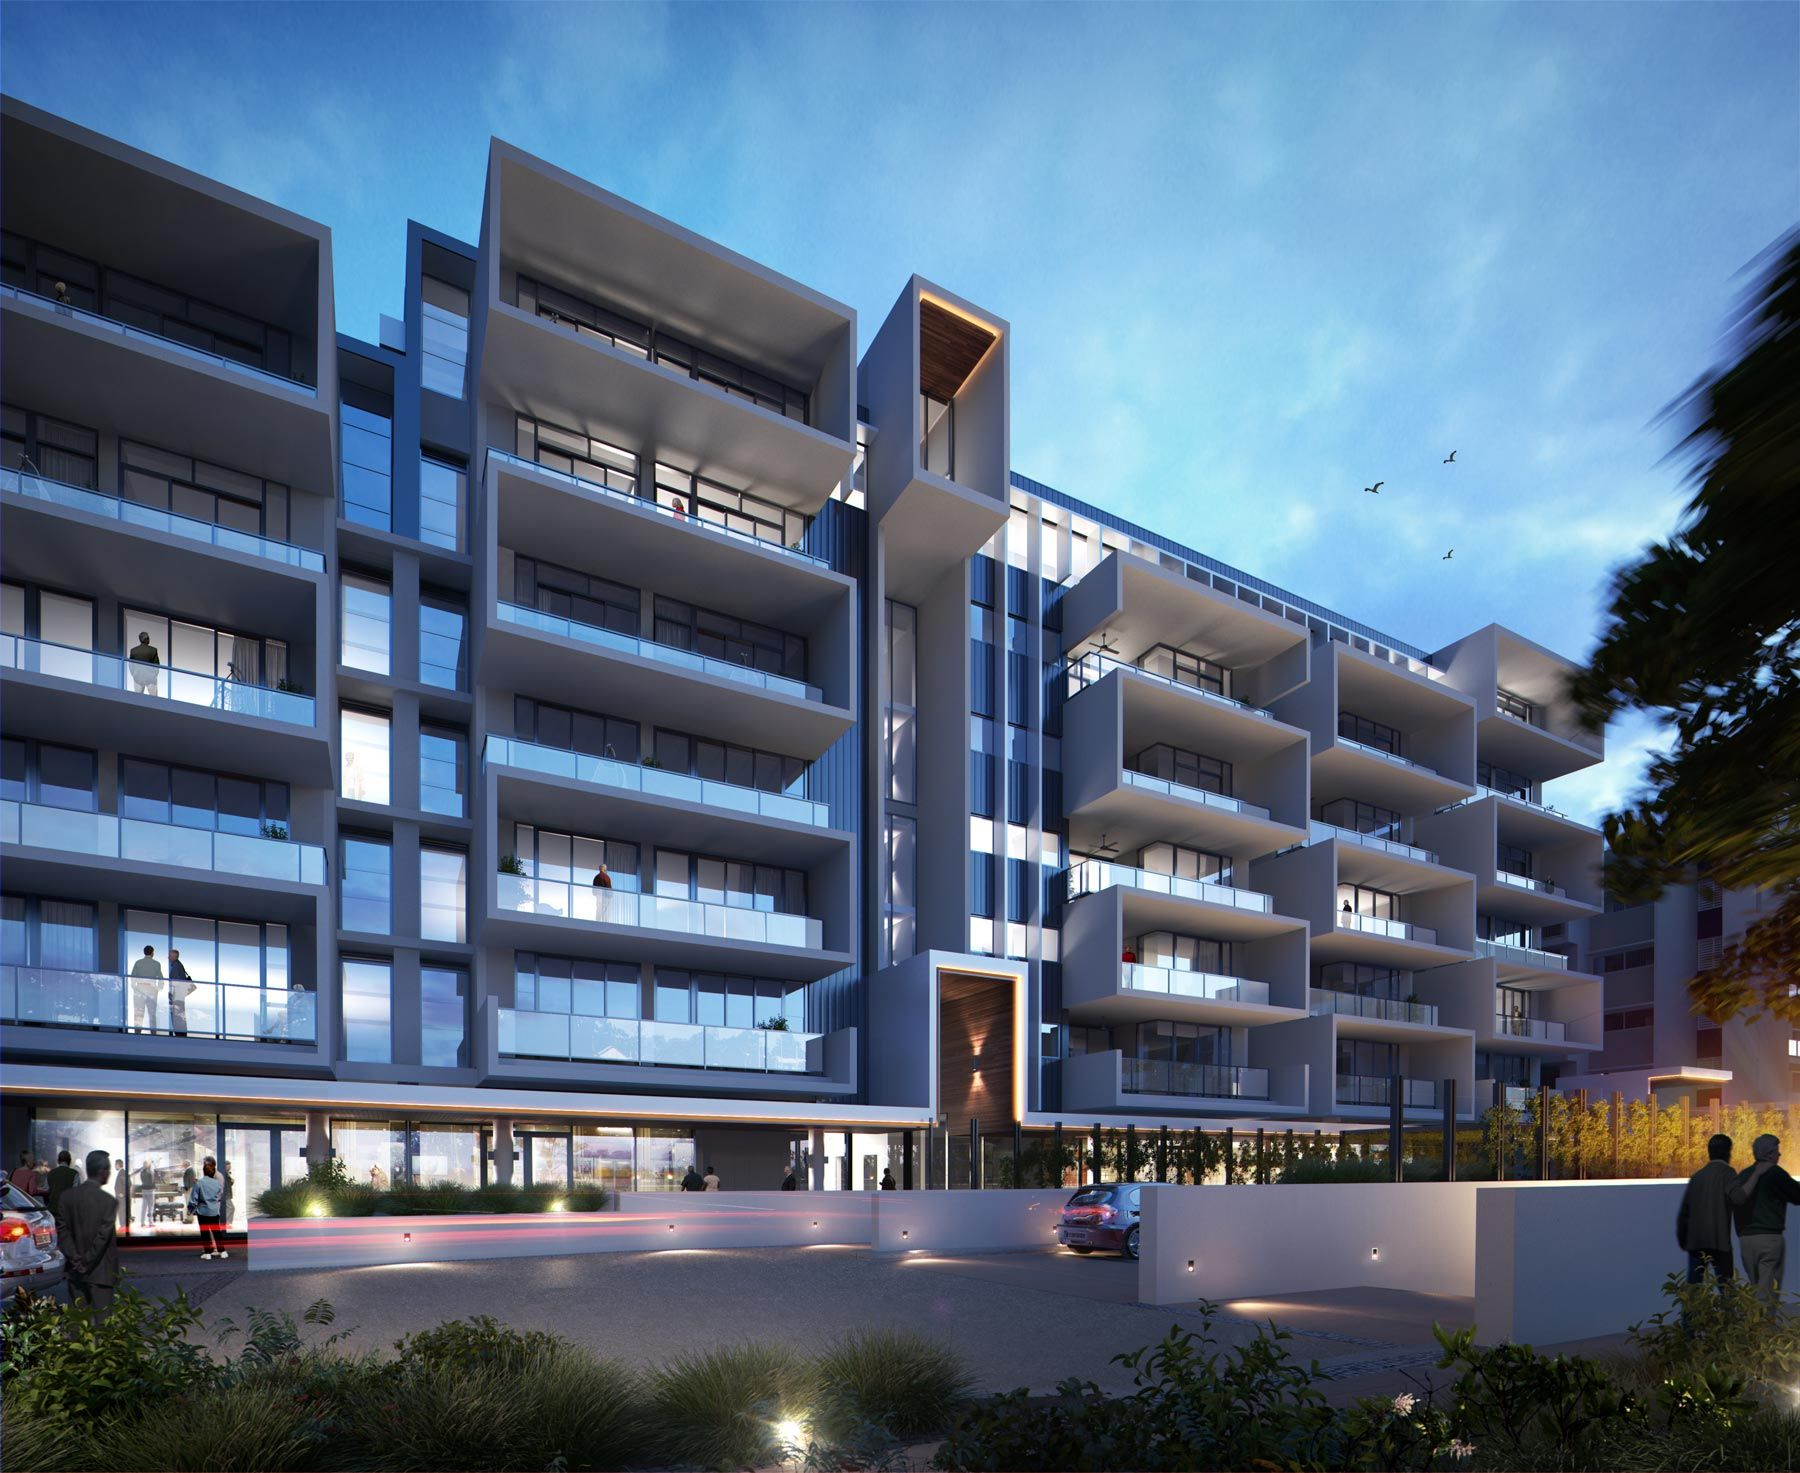 YERONGA VILLAGE BUILDING 5 DESCRIPTION 98 UNIT APARTMENT LOCATION QLD Commercial ArchitectureArchitecture Interior DesignExterior